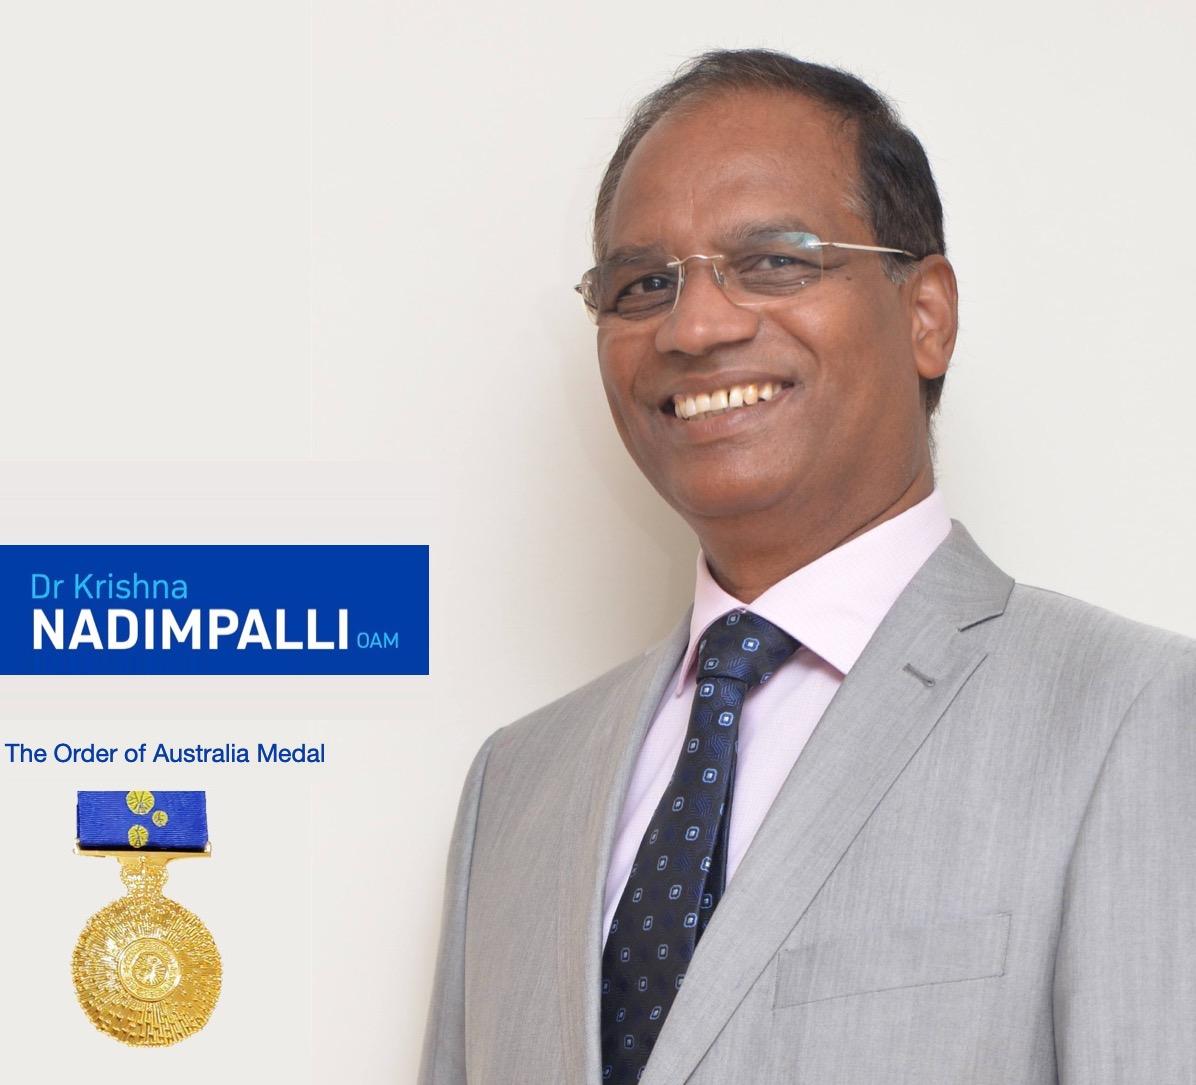 Dr.Krishna-NADIMPALLI-OAM